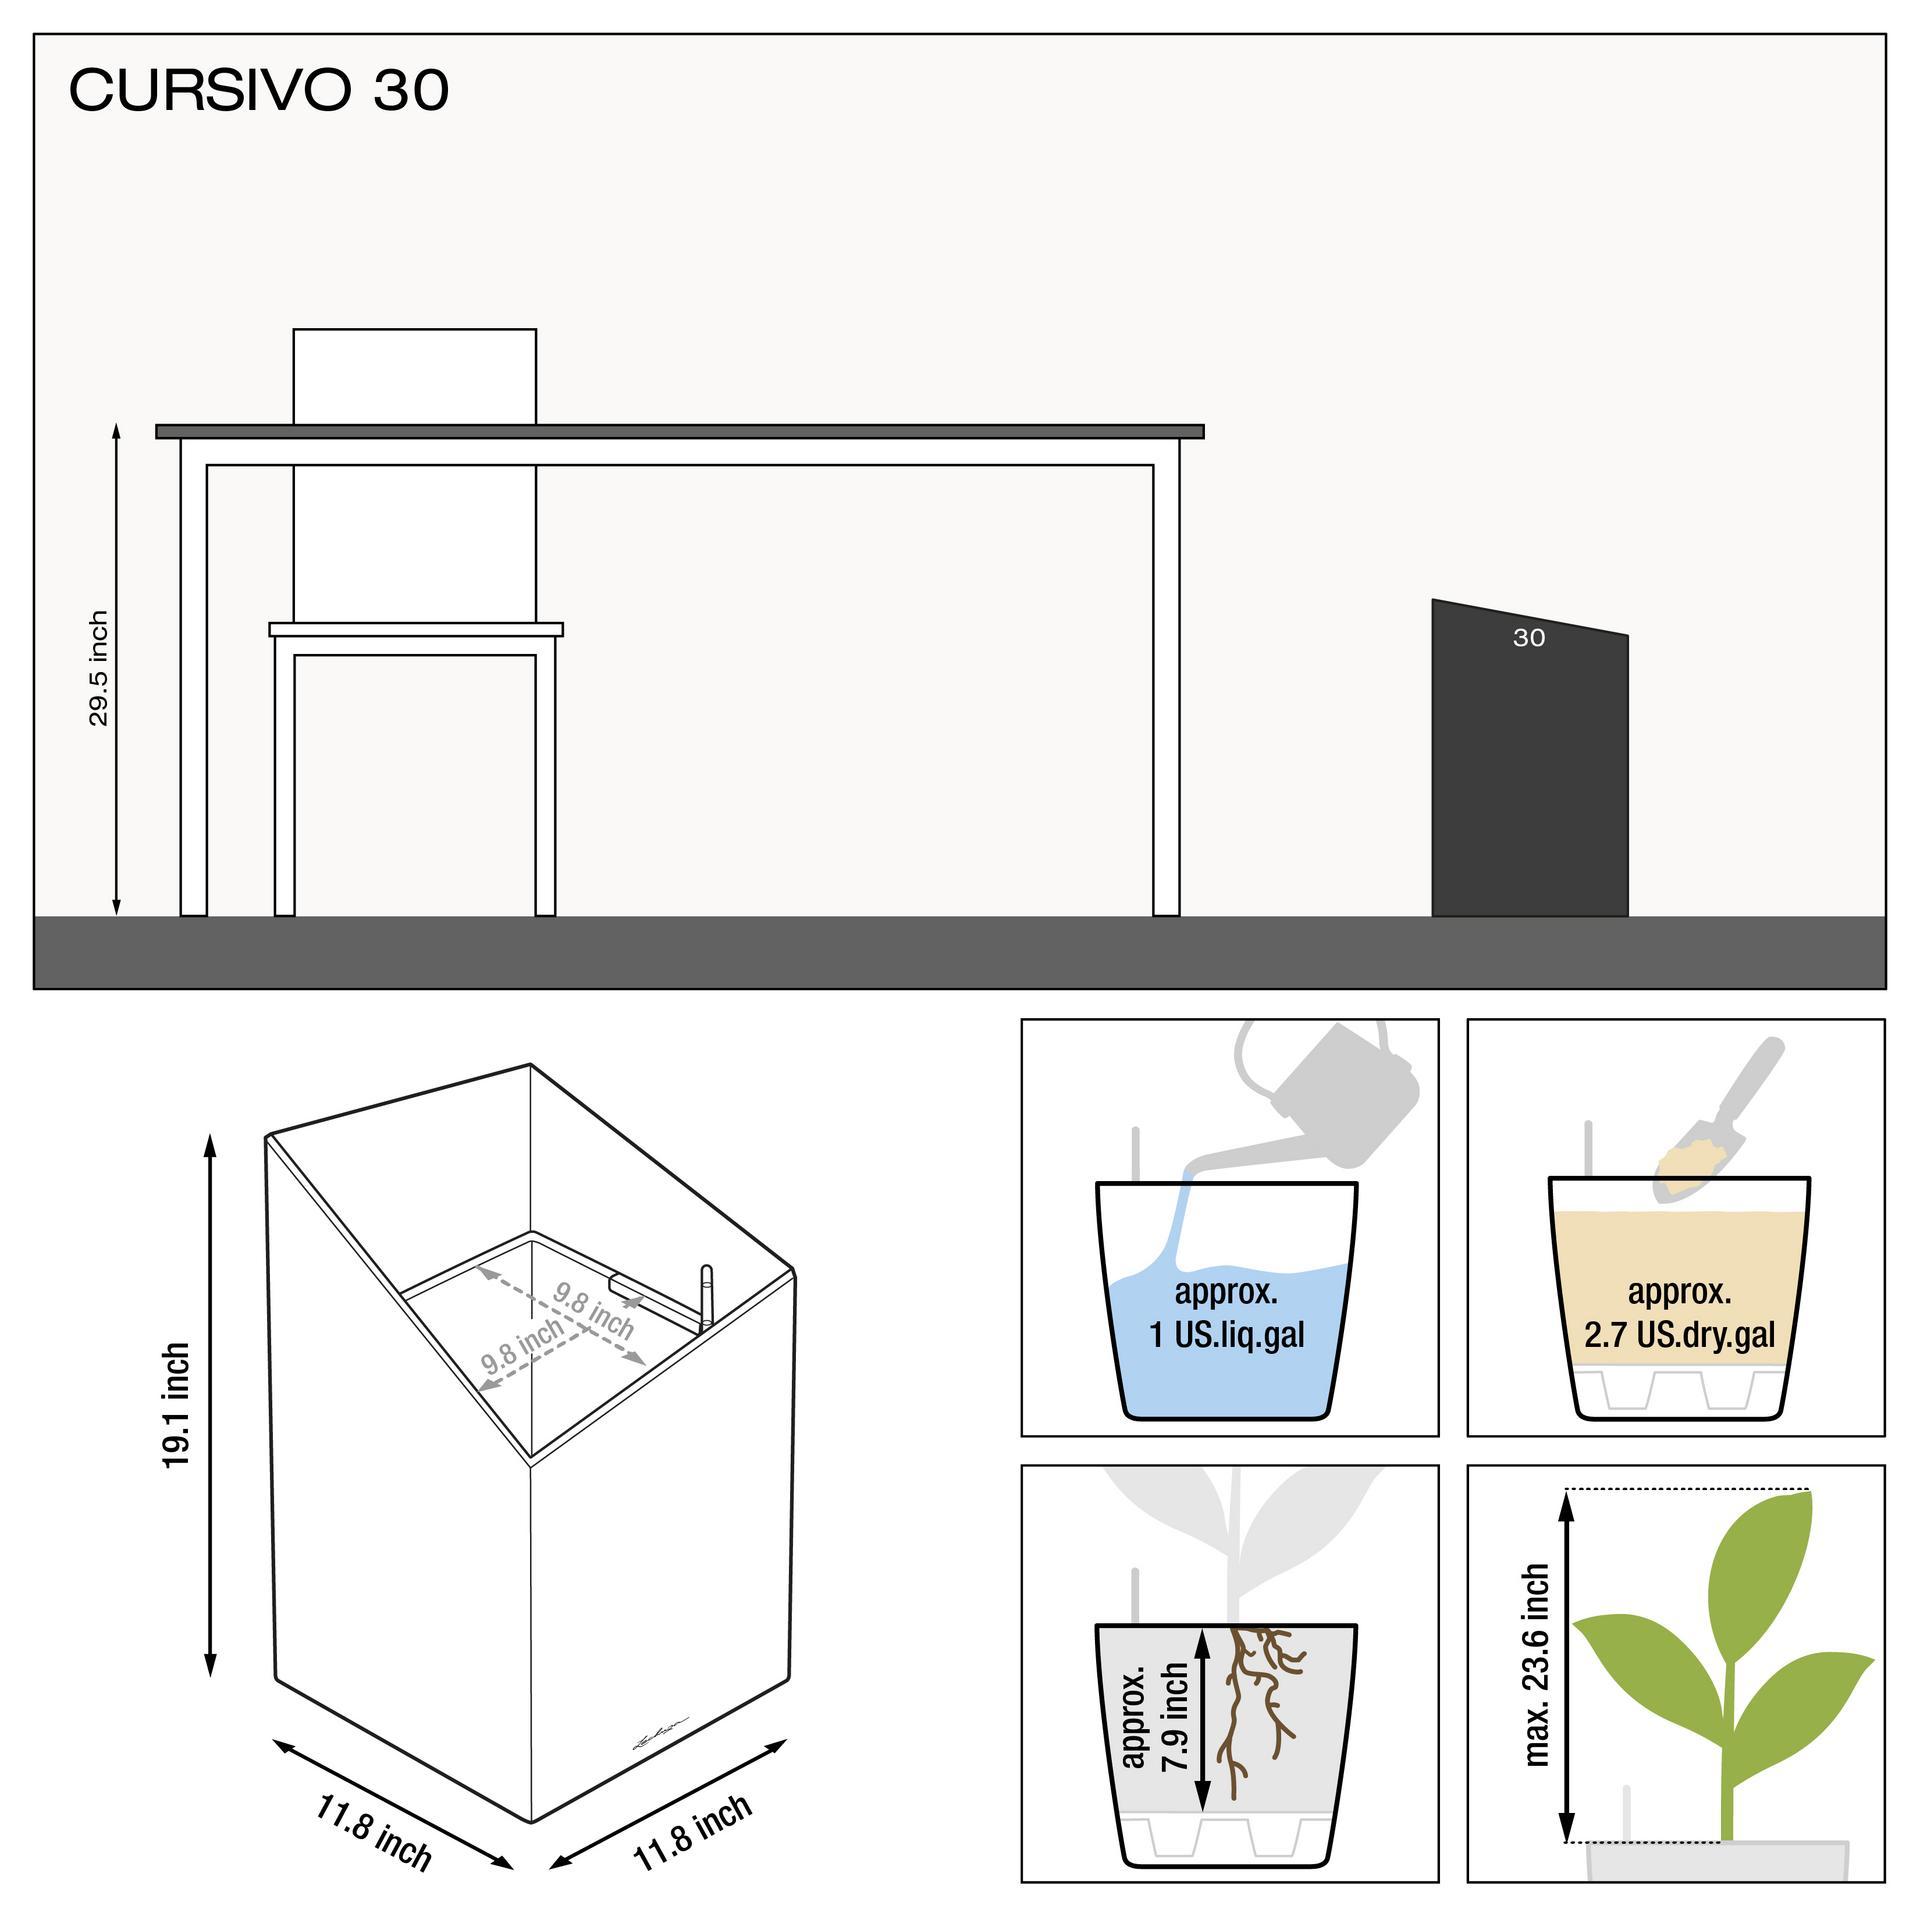 le_cursivo30_product_addi_nz_us